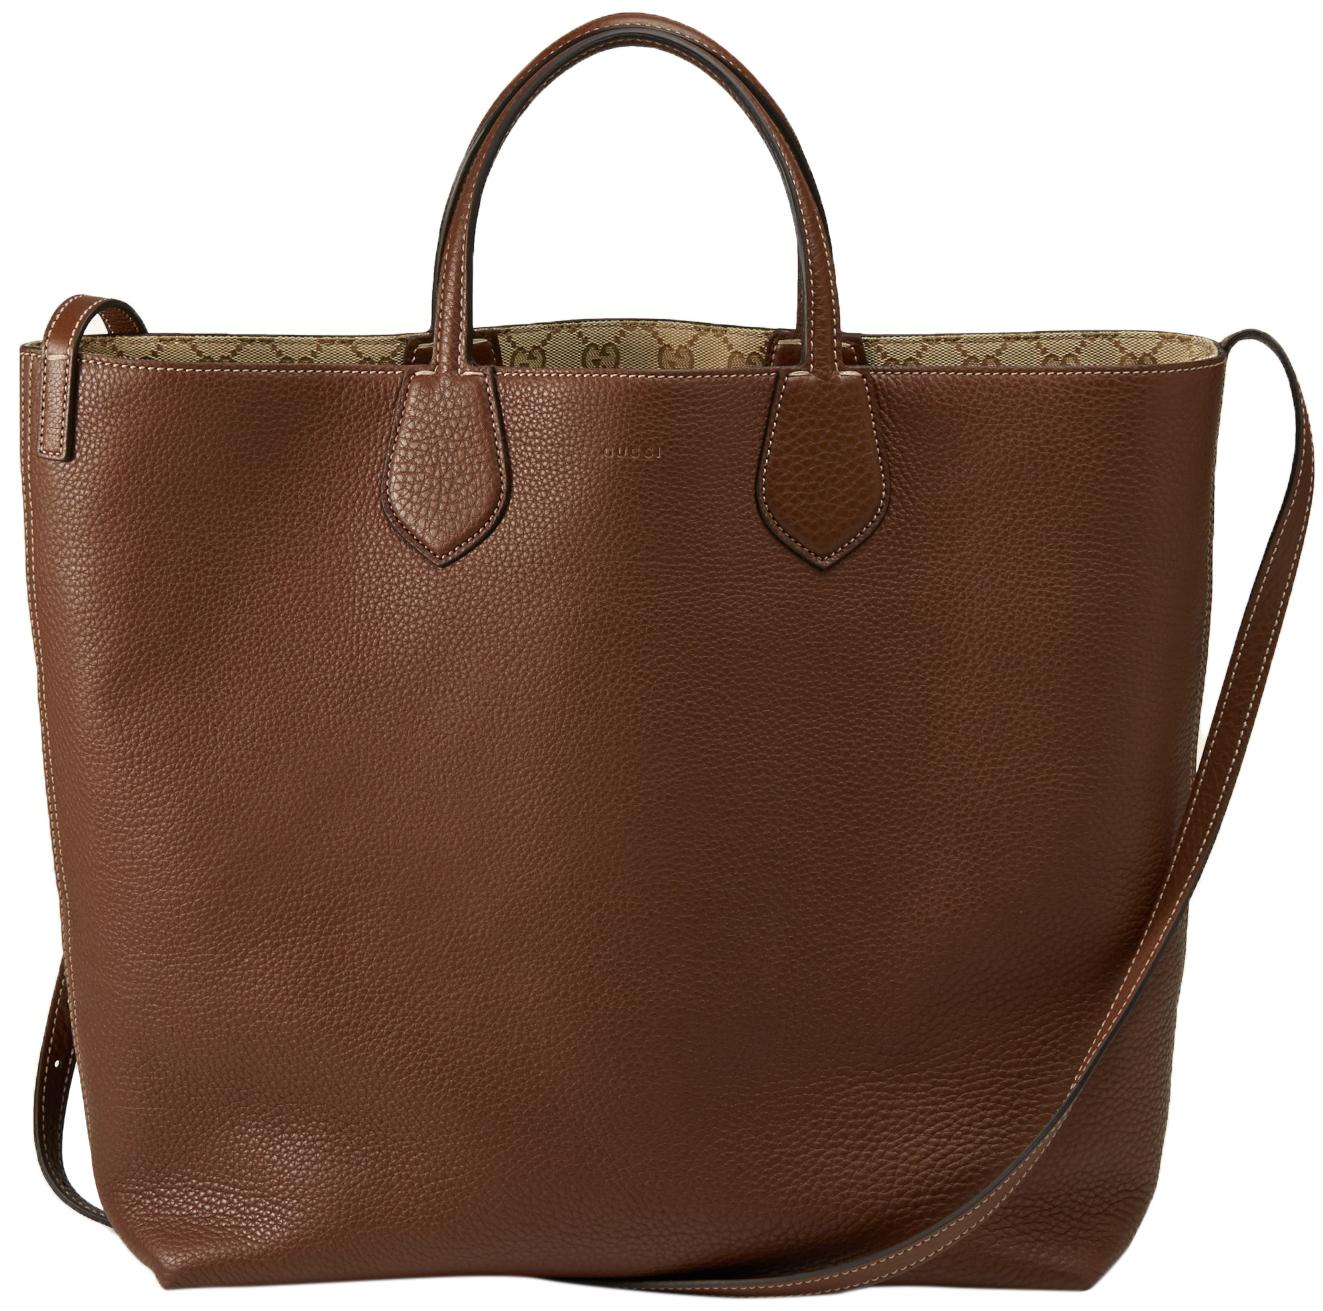 4ed0e1b84d3d Gucci Beige Brown Original GG Canvas Leather Ramble Reversible Tote Bag